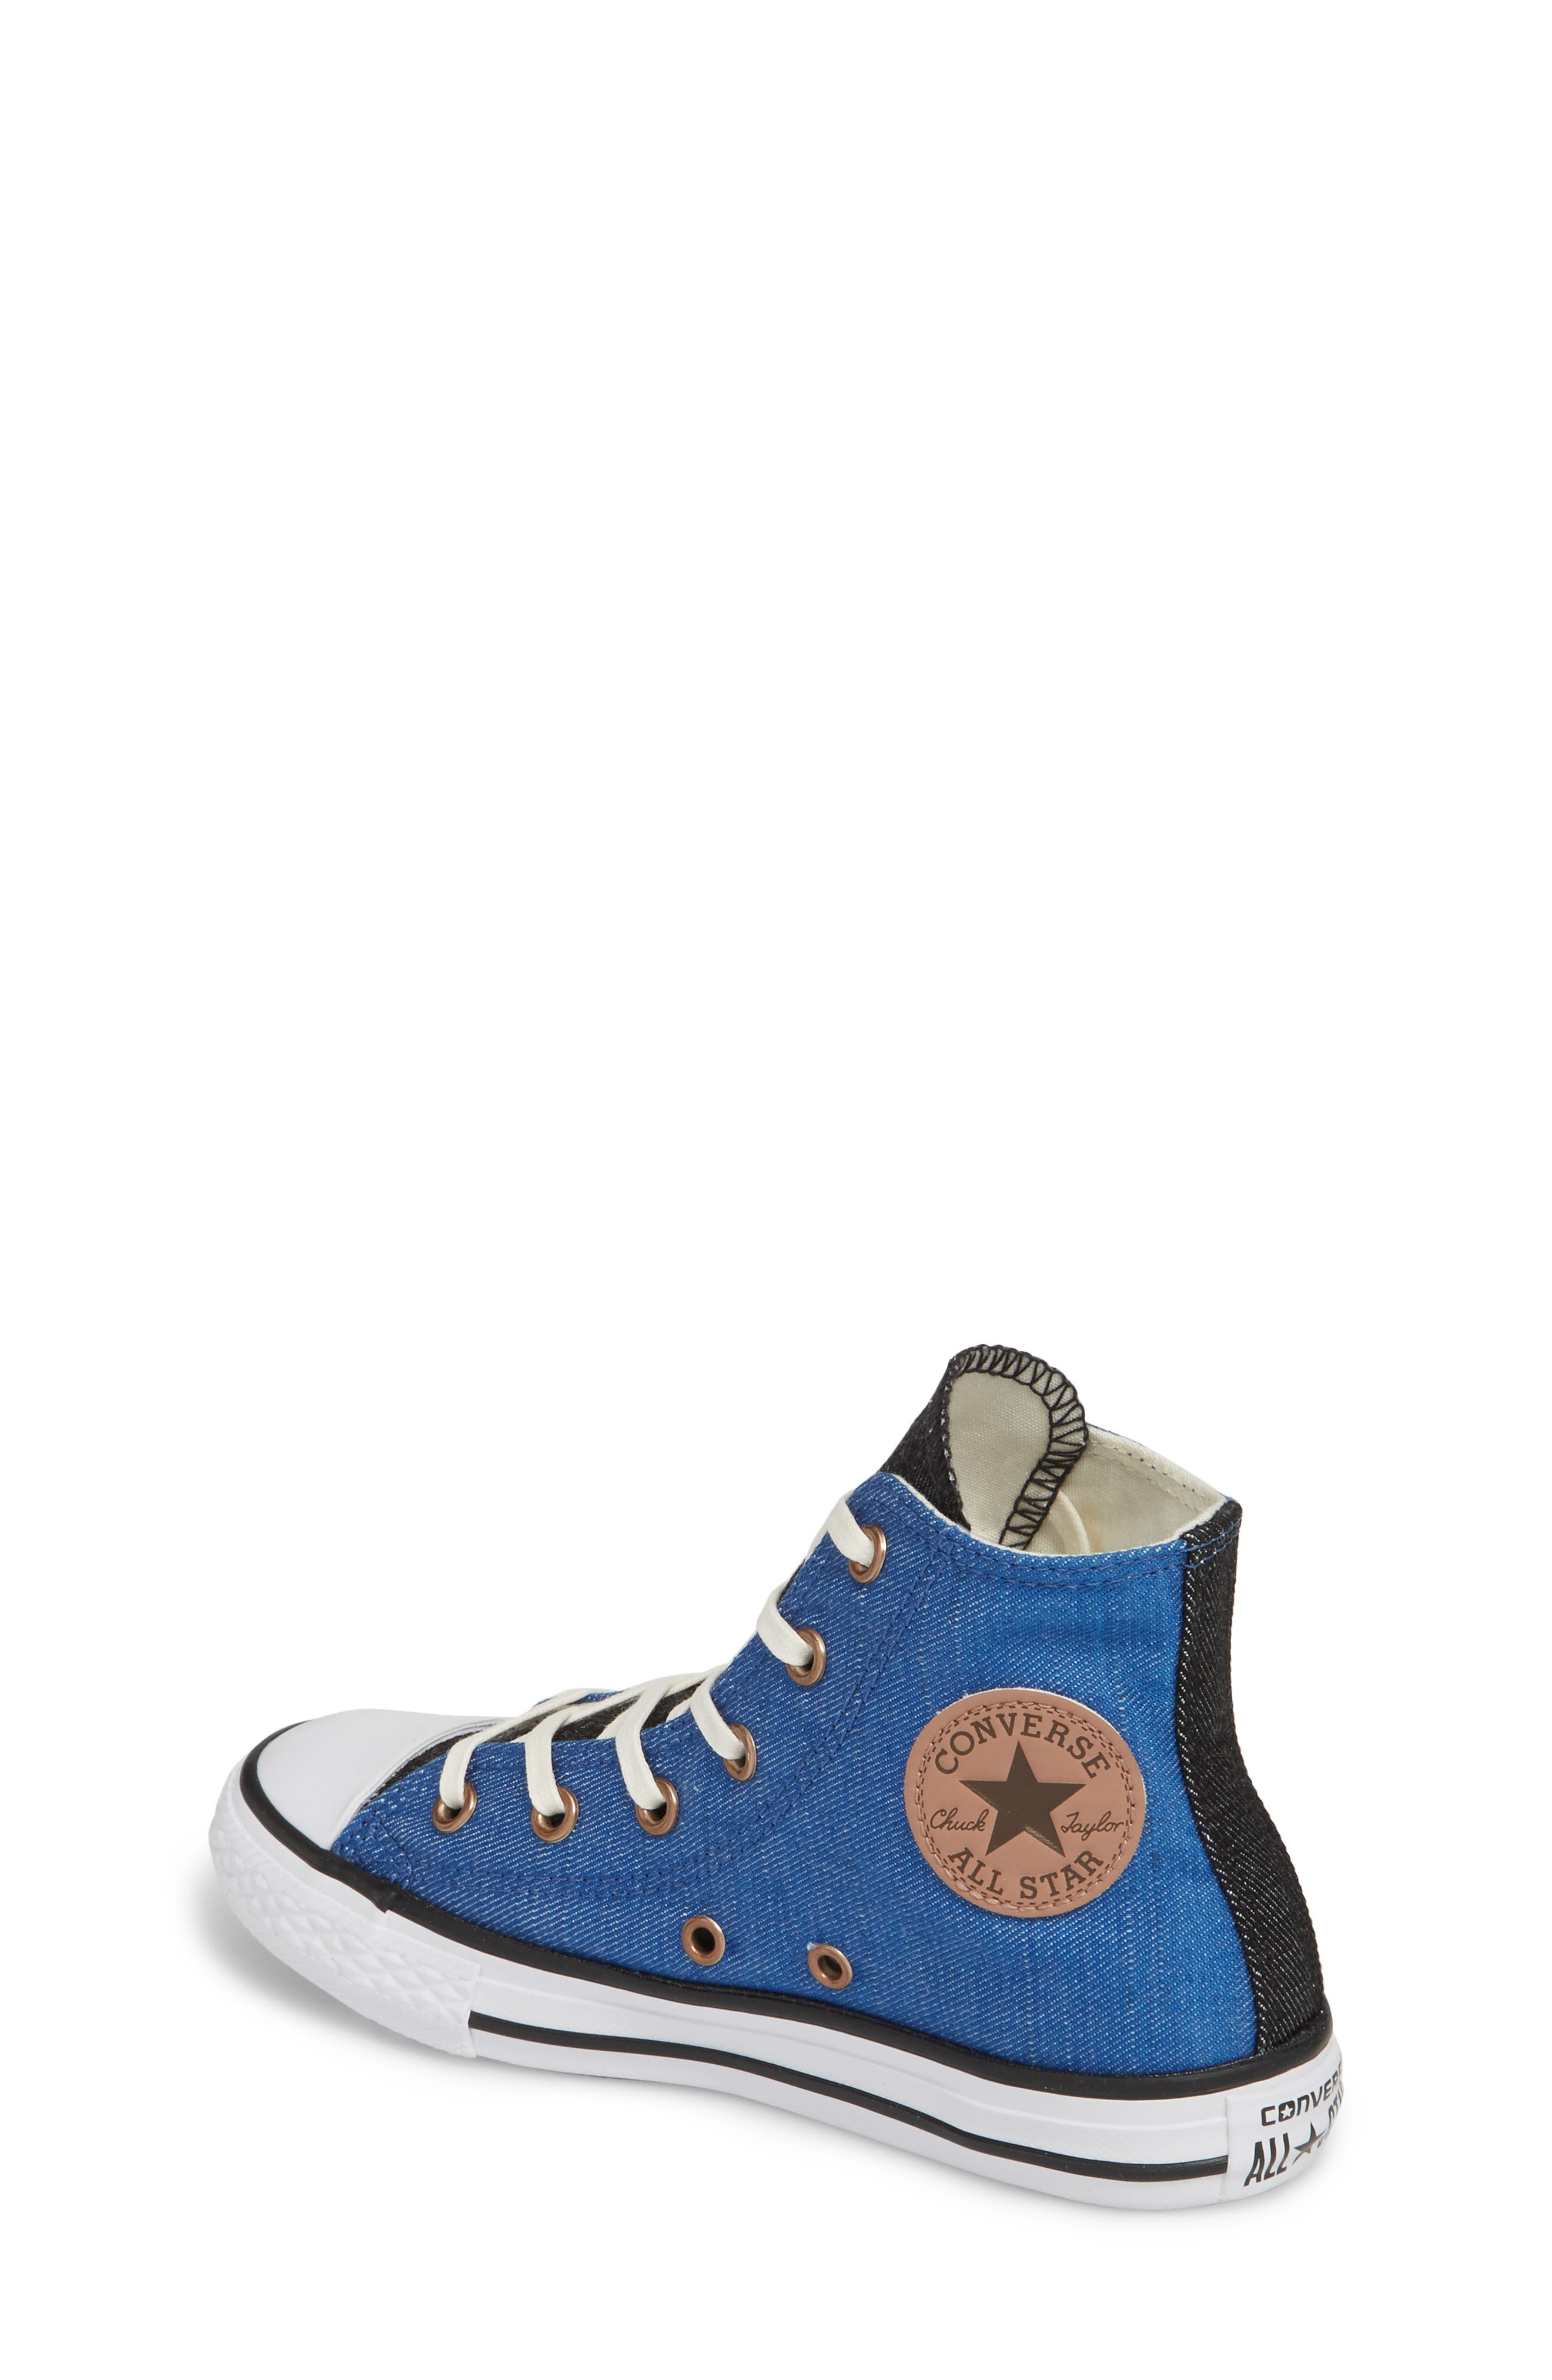 Chuck Taylor<sup>®</sup> All Star<sup>®</sup> Chambray High Top Sneaker,                             Alternate thumbnail 2, color,                             Nightfall Blue